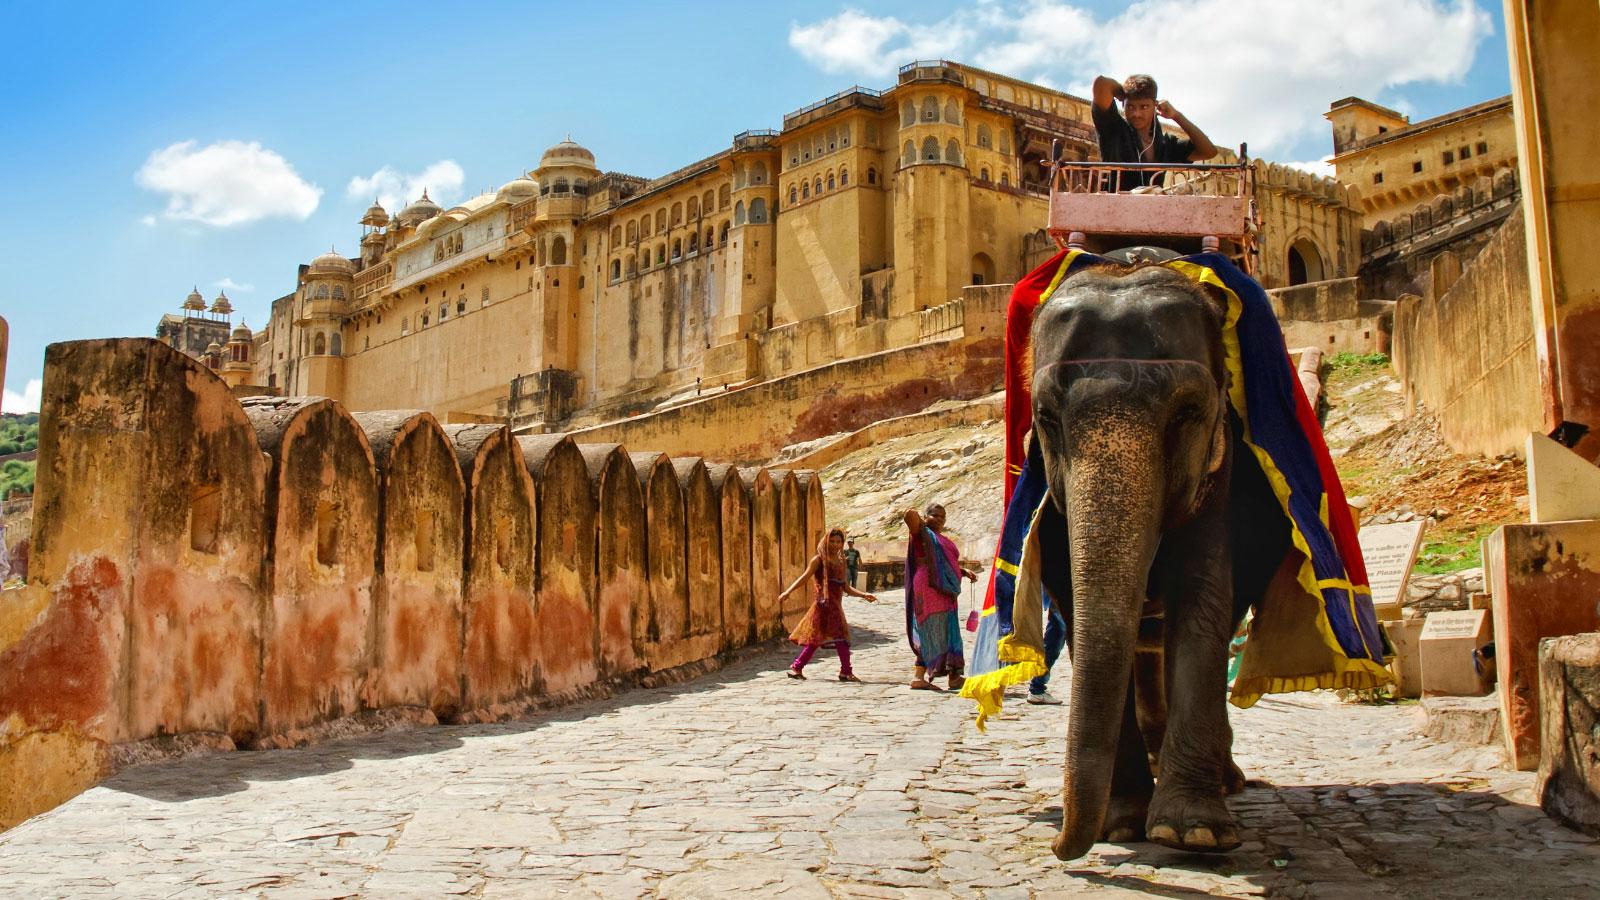 Elephant ride in Amber Fort, Jaipur